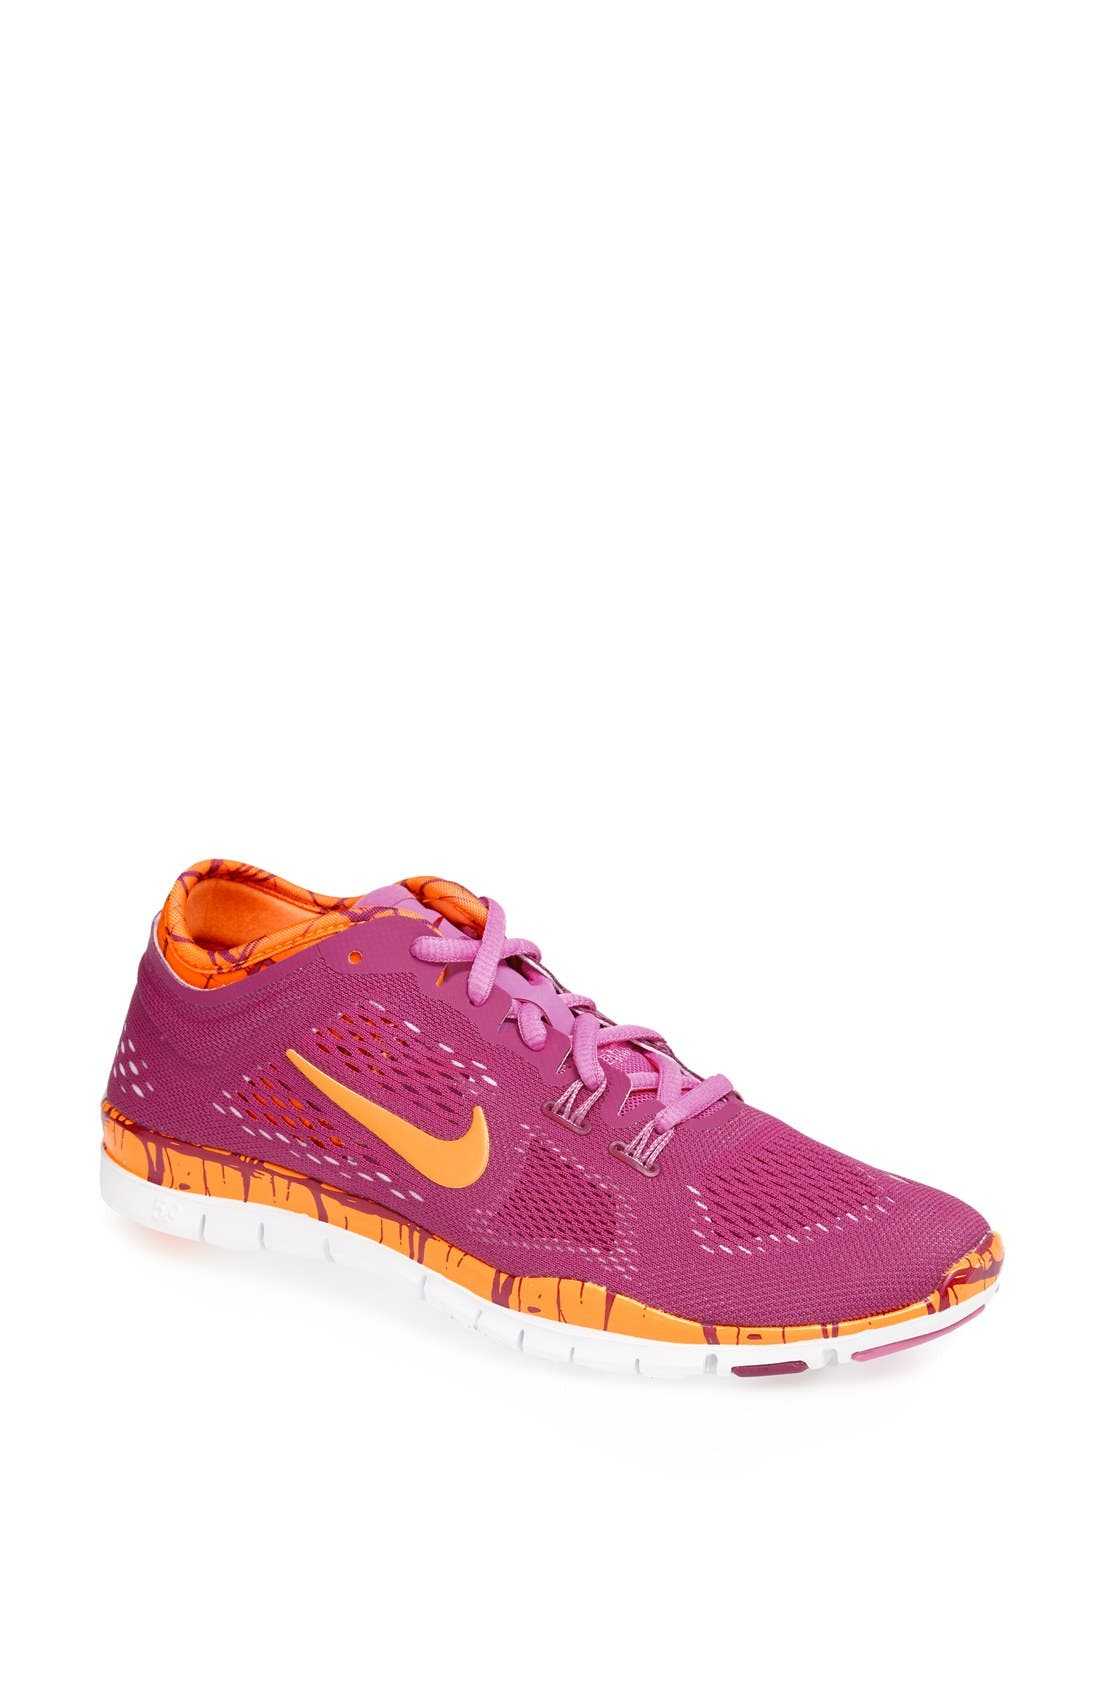 Alternate Image 1 Selected - Nike 'Free 5.0 TR Fit 4' Print Training Shoe (Women)